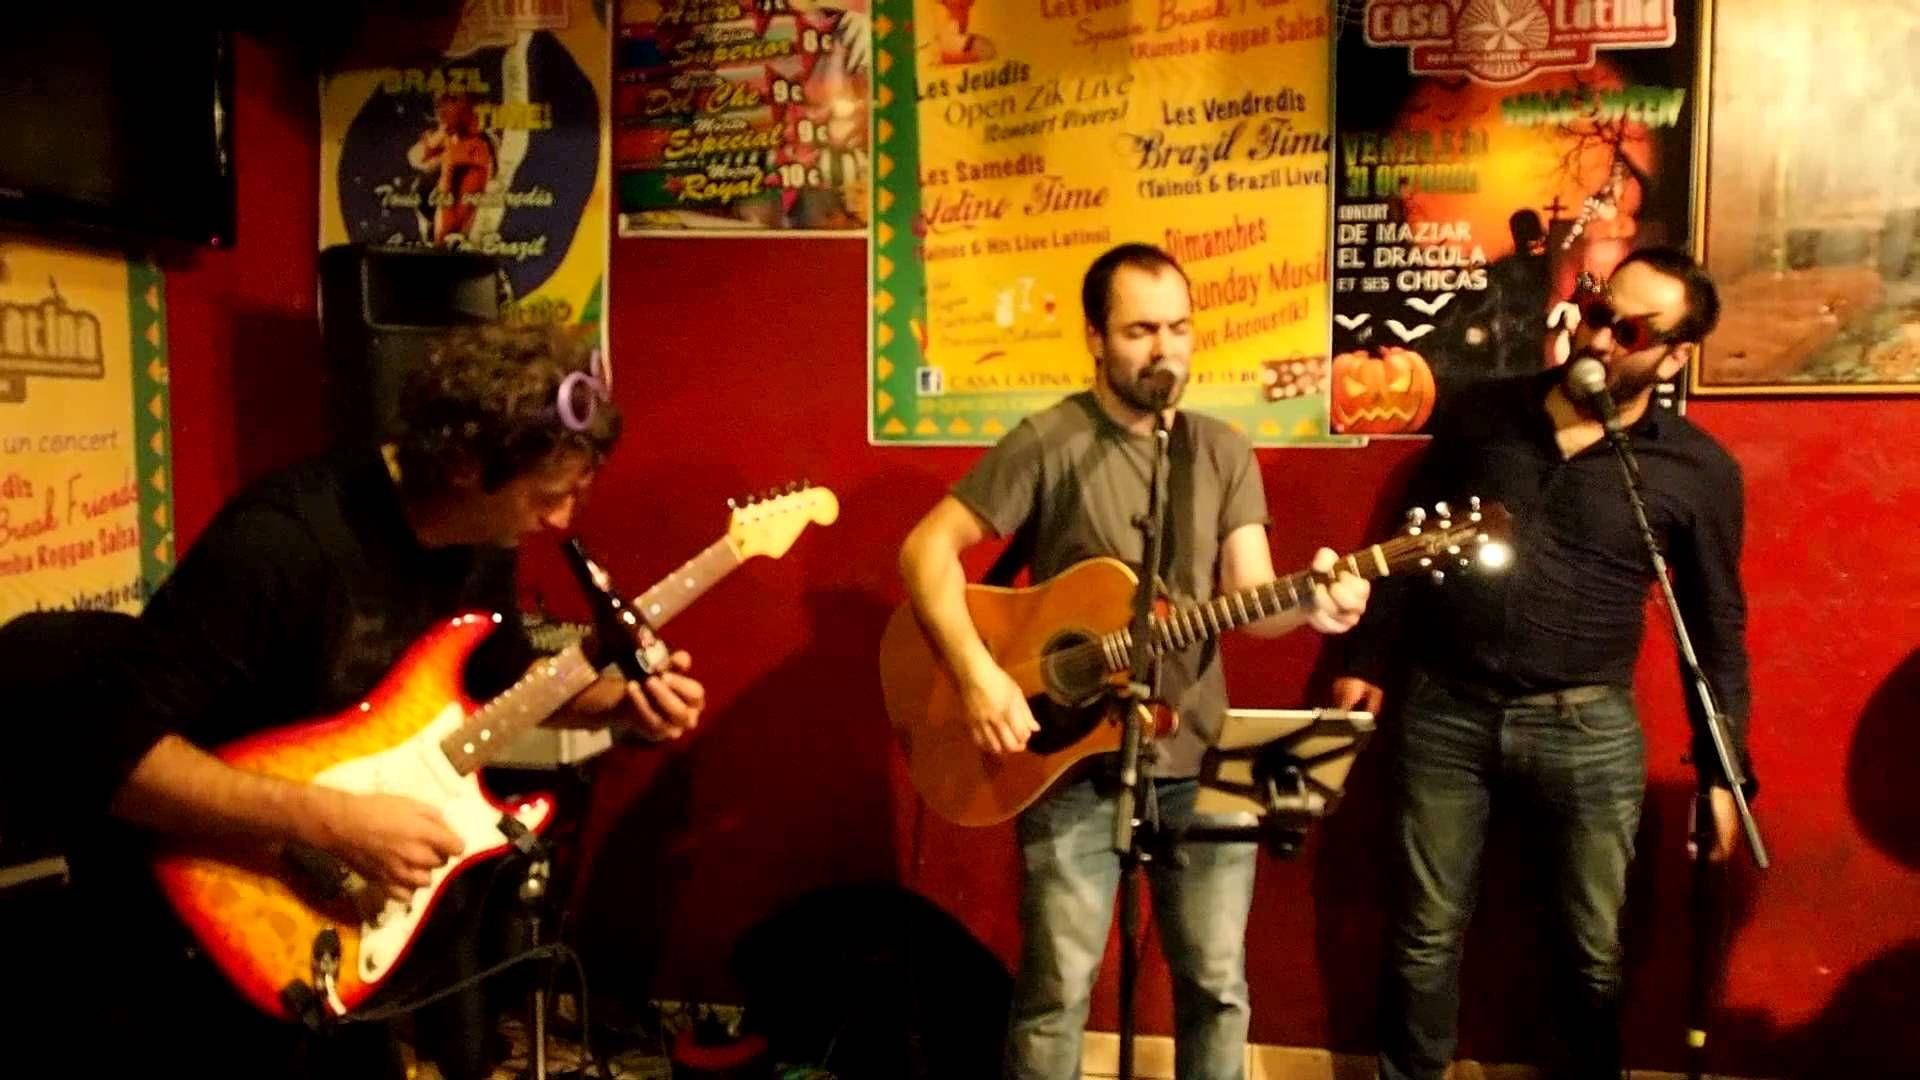 Marc Rosa Open Sunday Music Casa Latina le 16 novembre